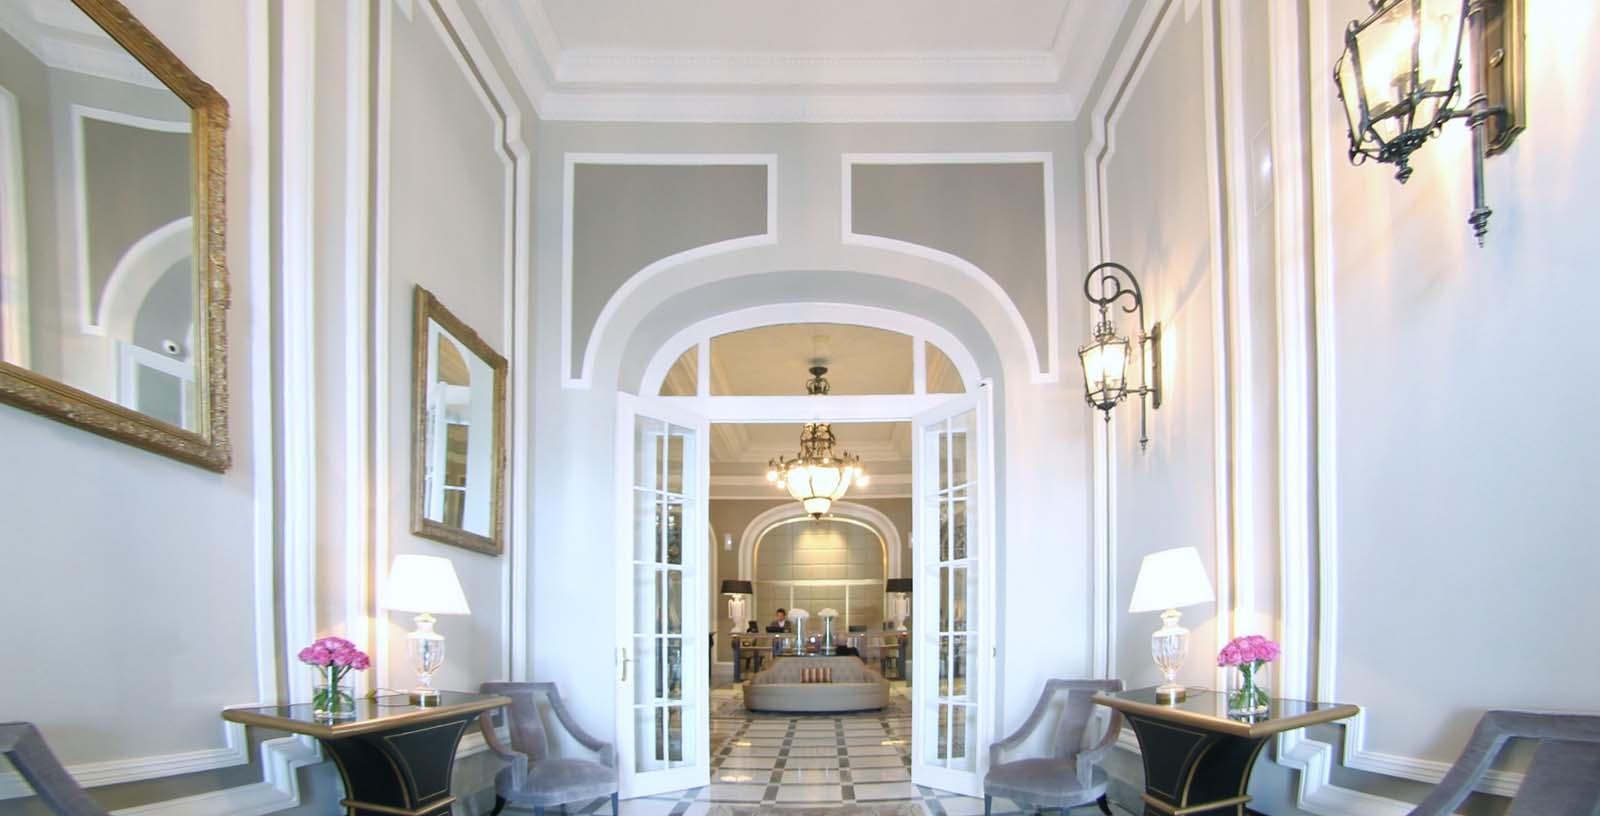 Maria_Cristina_Hotel_04_Building_Idom